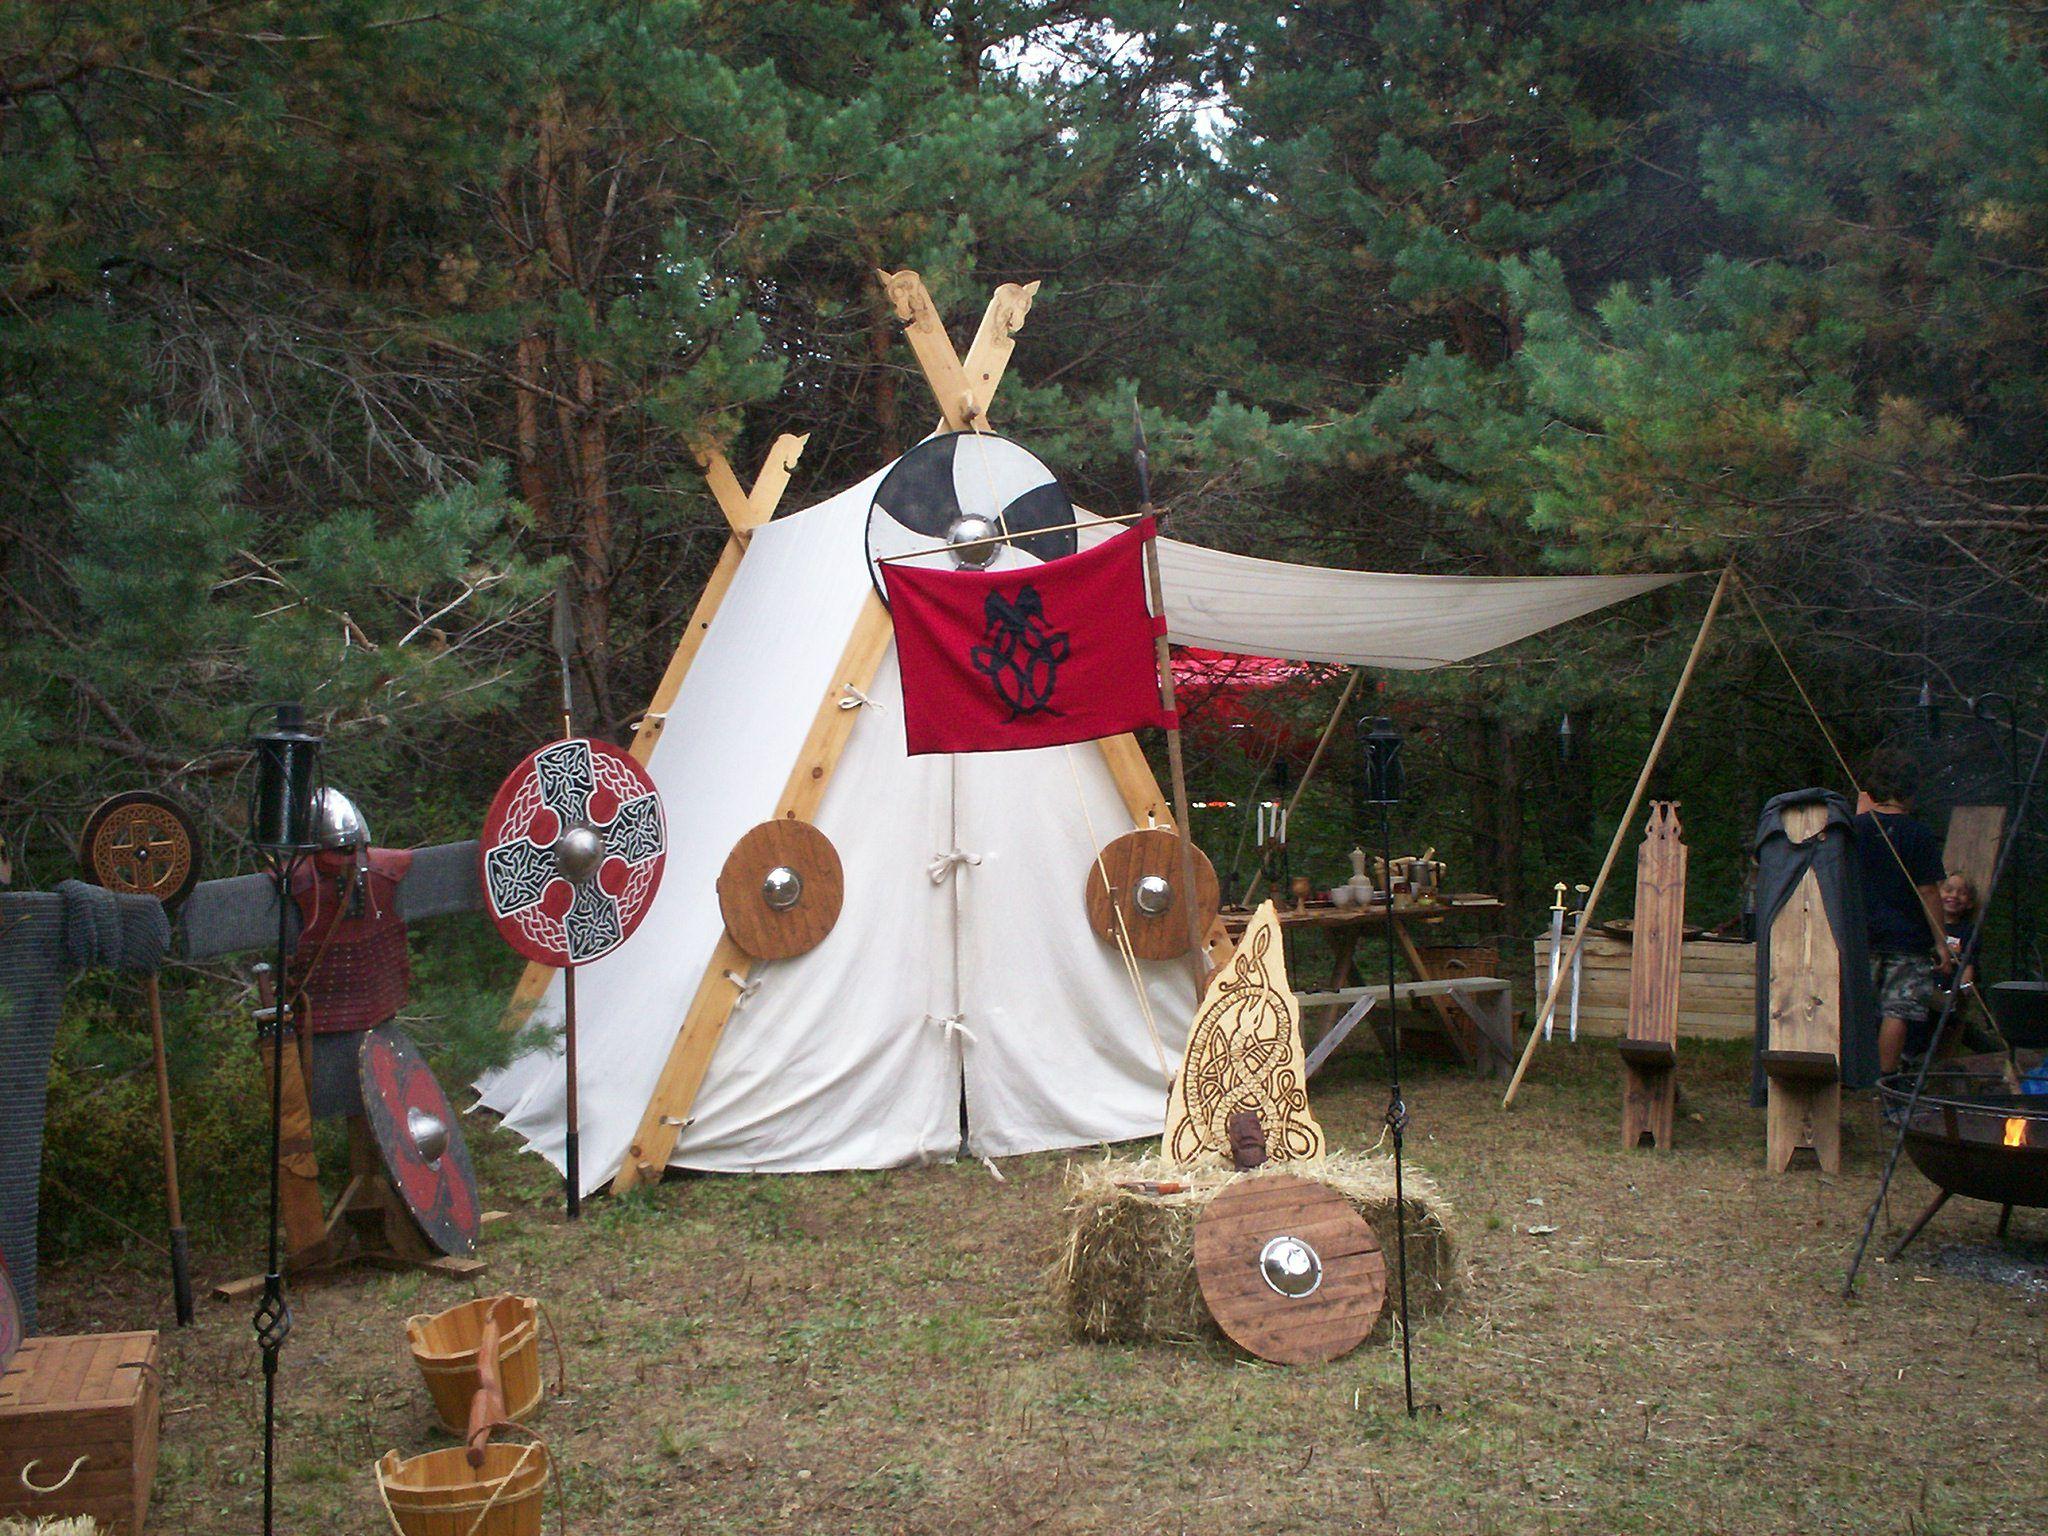 Viking tent by ~Branwulf on deviantART & Viking tent by ~Branwulf on deviantART | Camp | Pinterest ...